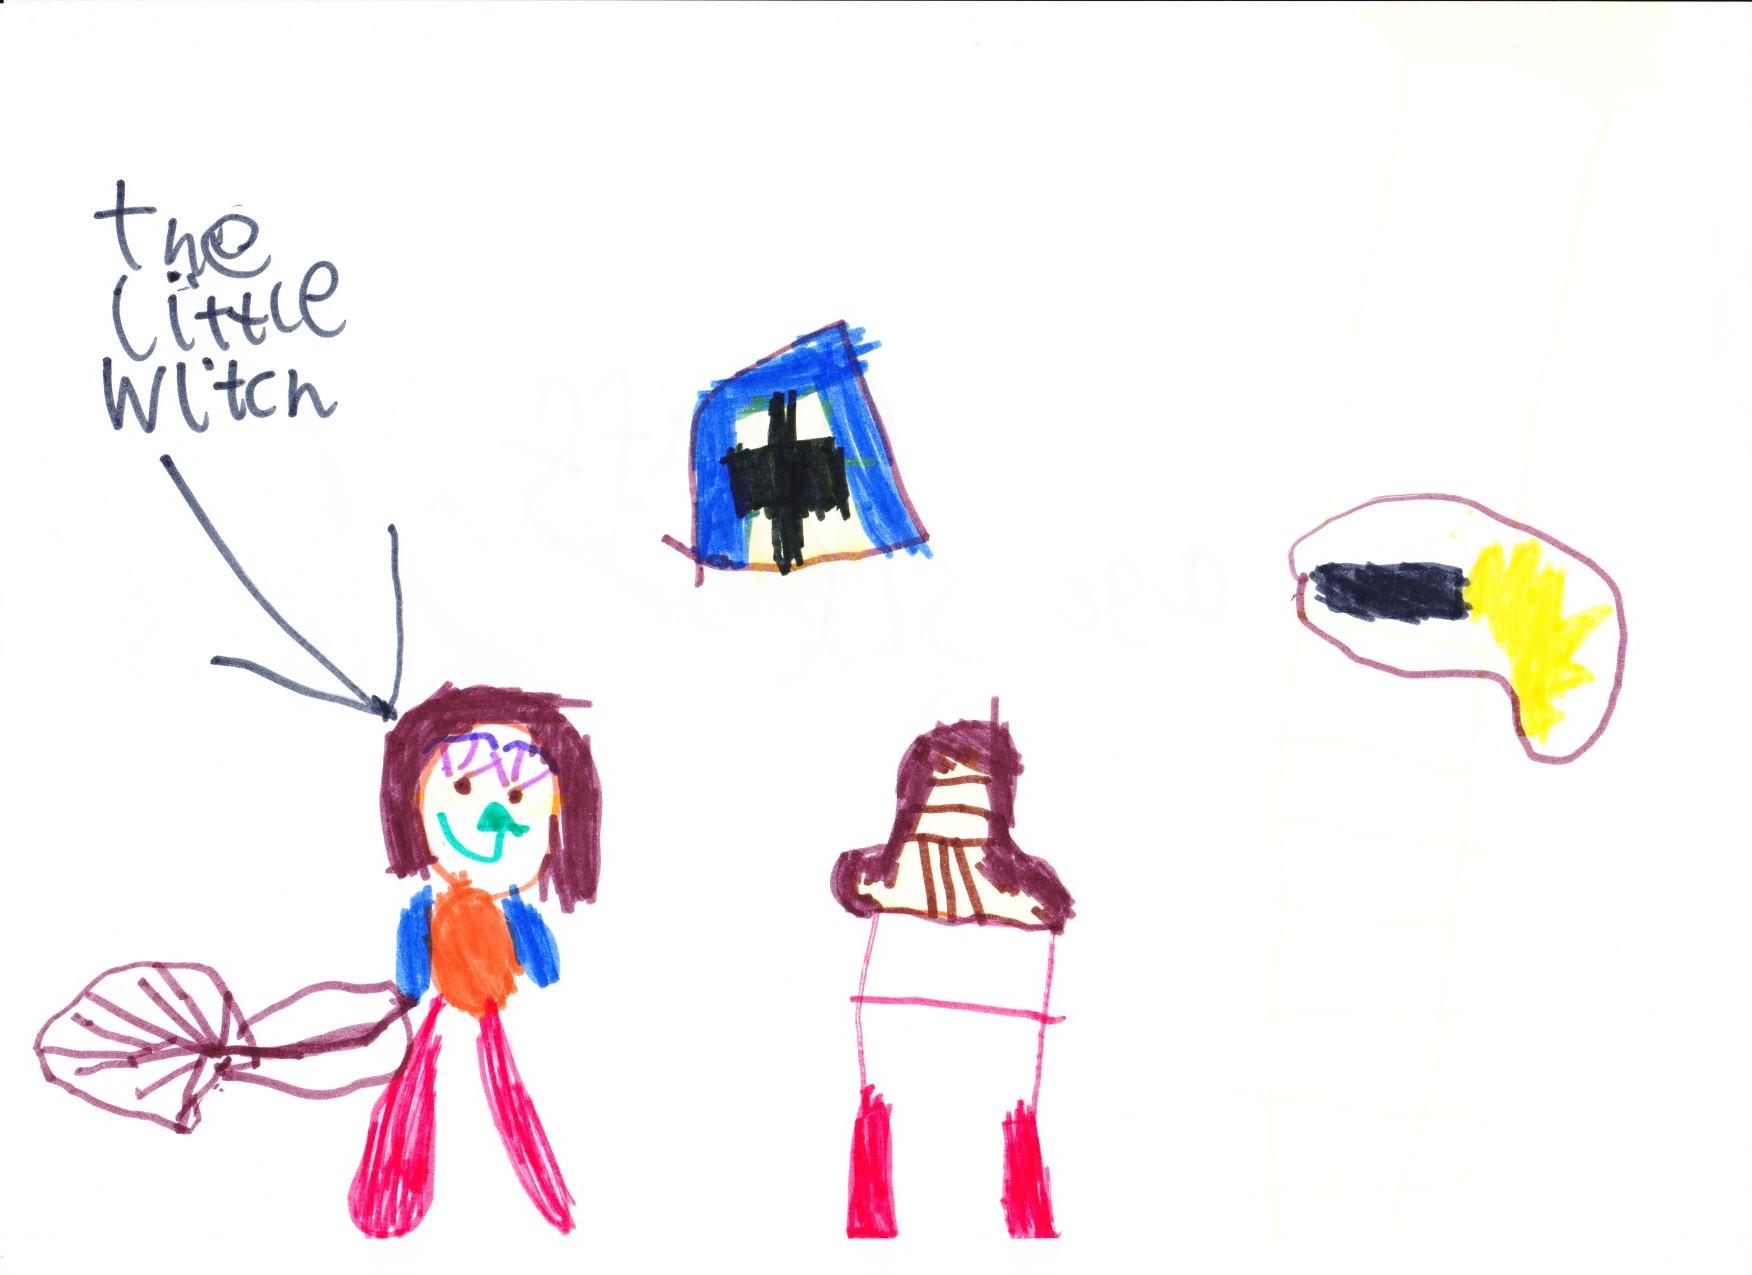 Chloe McGiff, Age 6